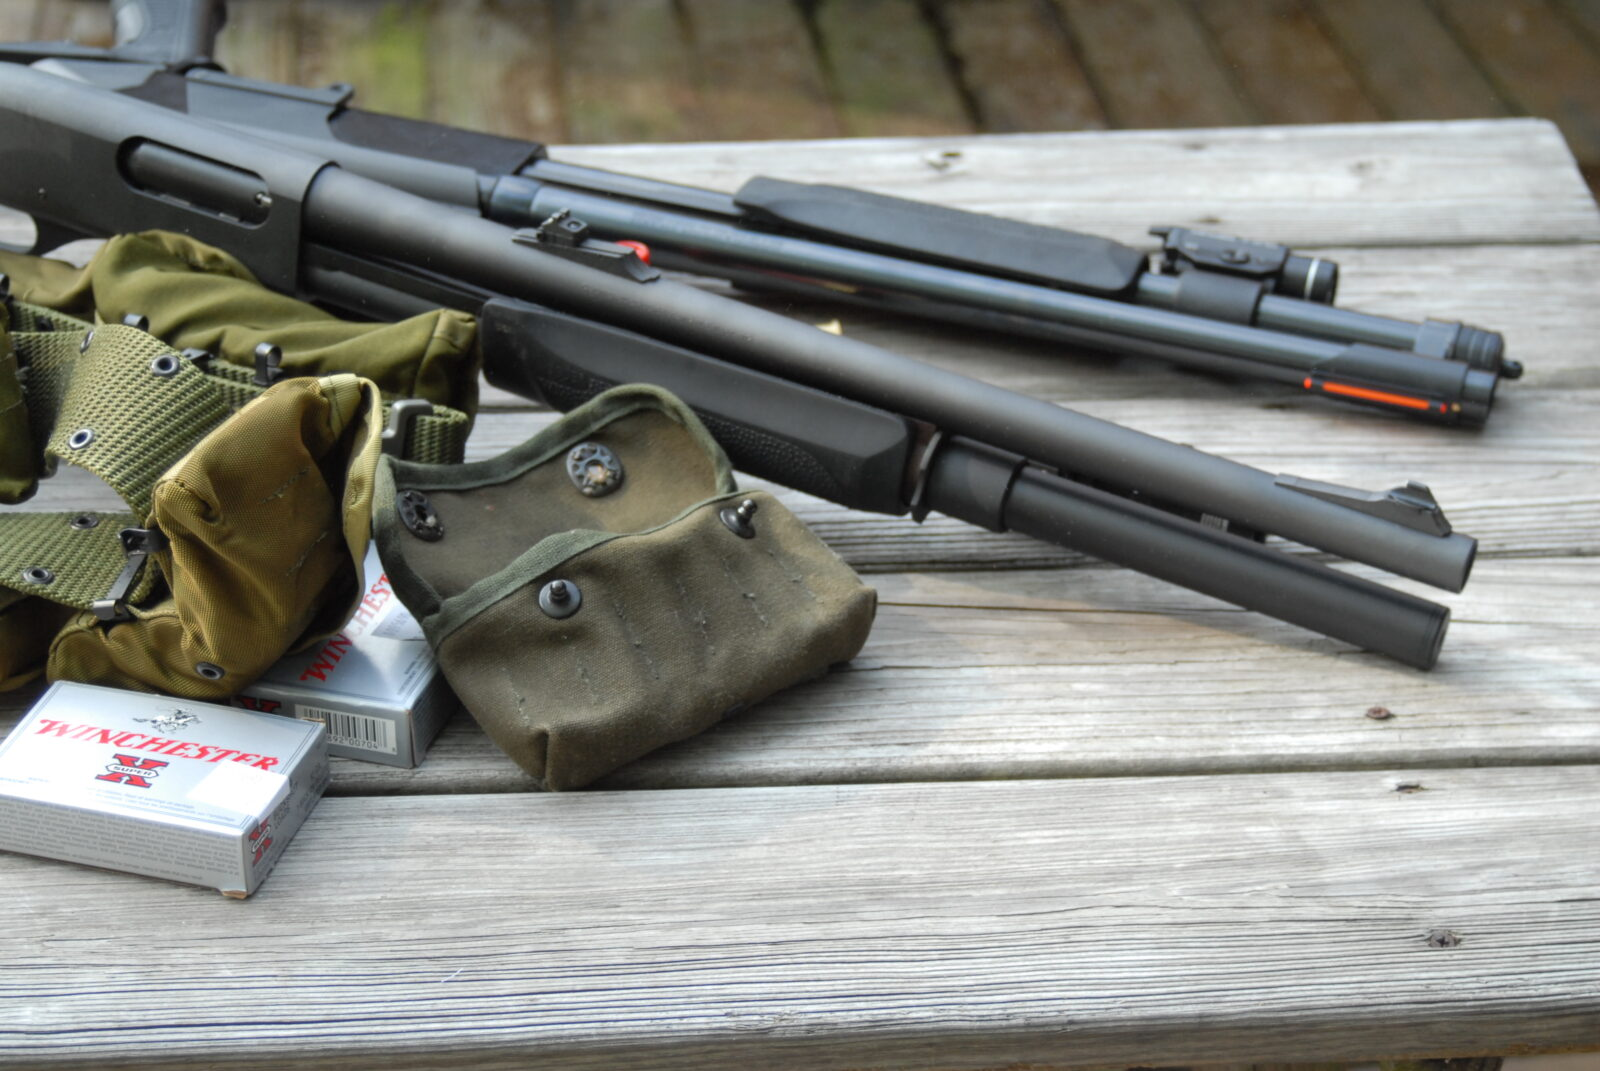 Remington 870 and Winchester 1200 Riot Shotguns